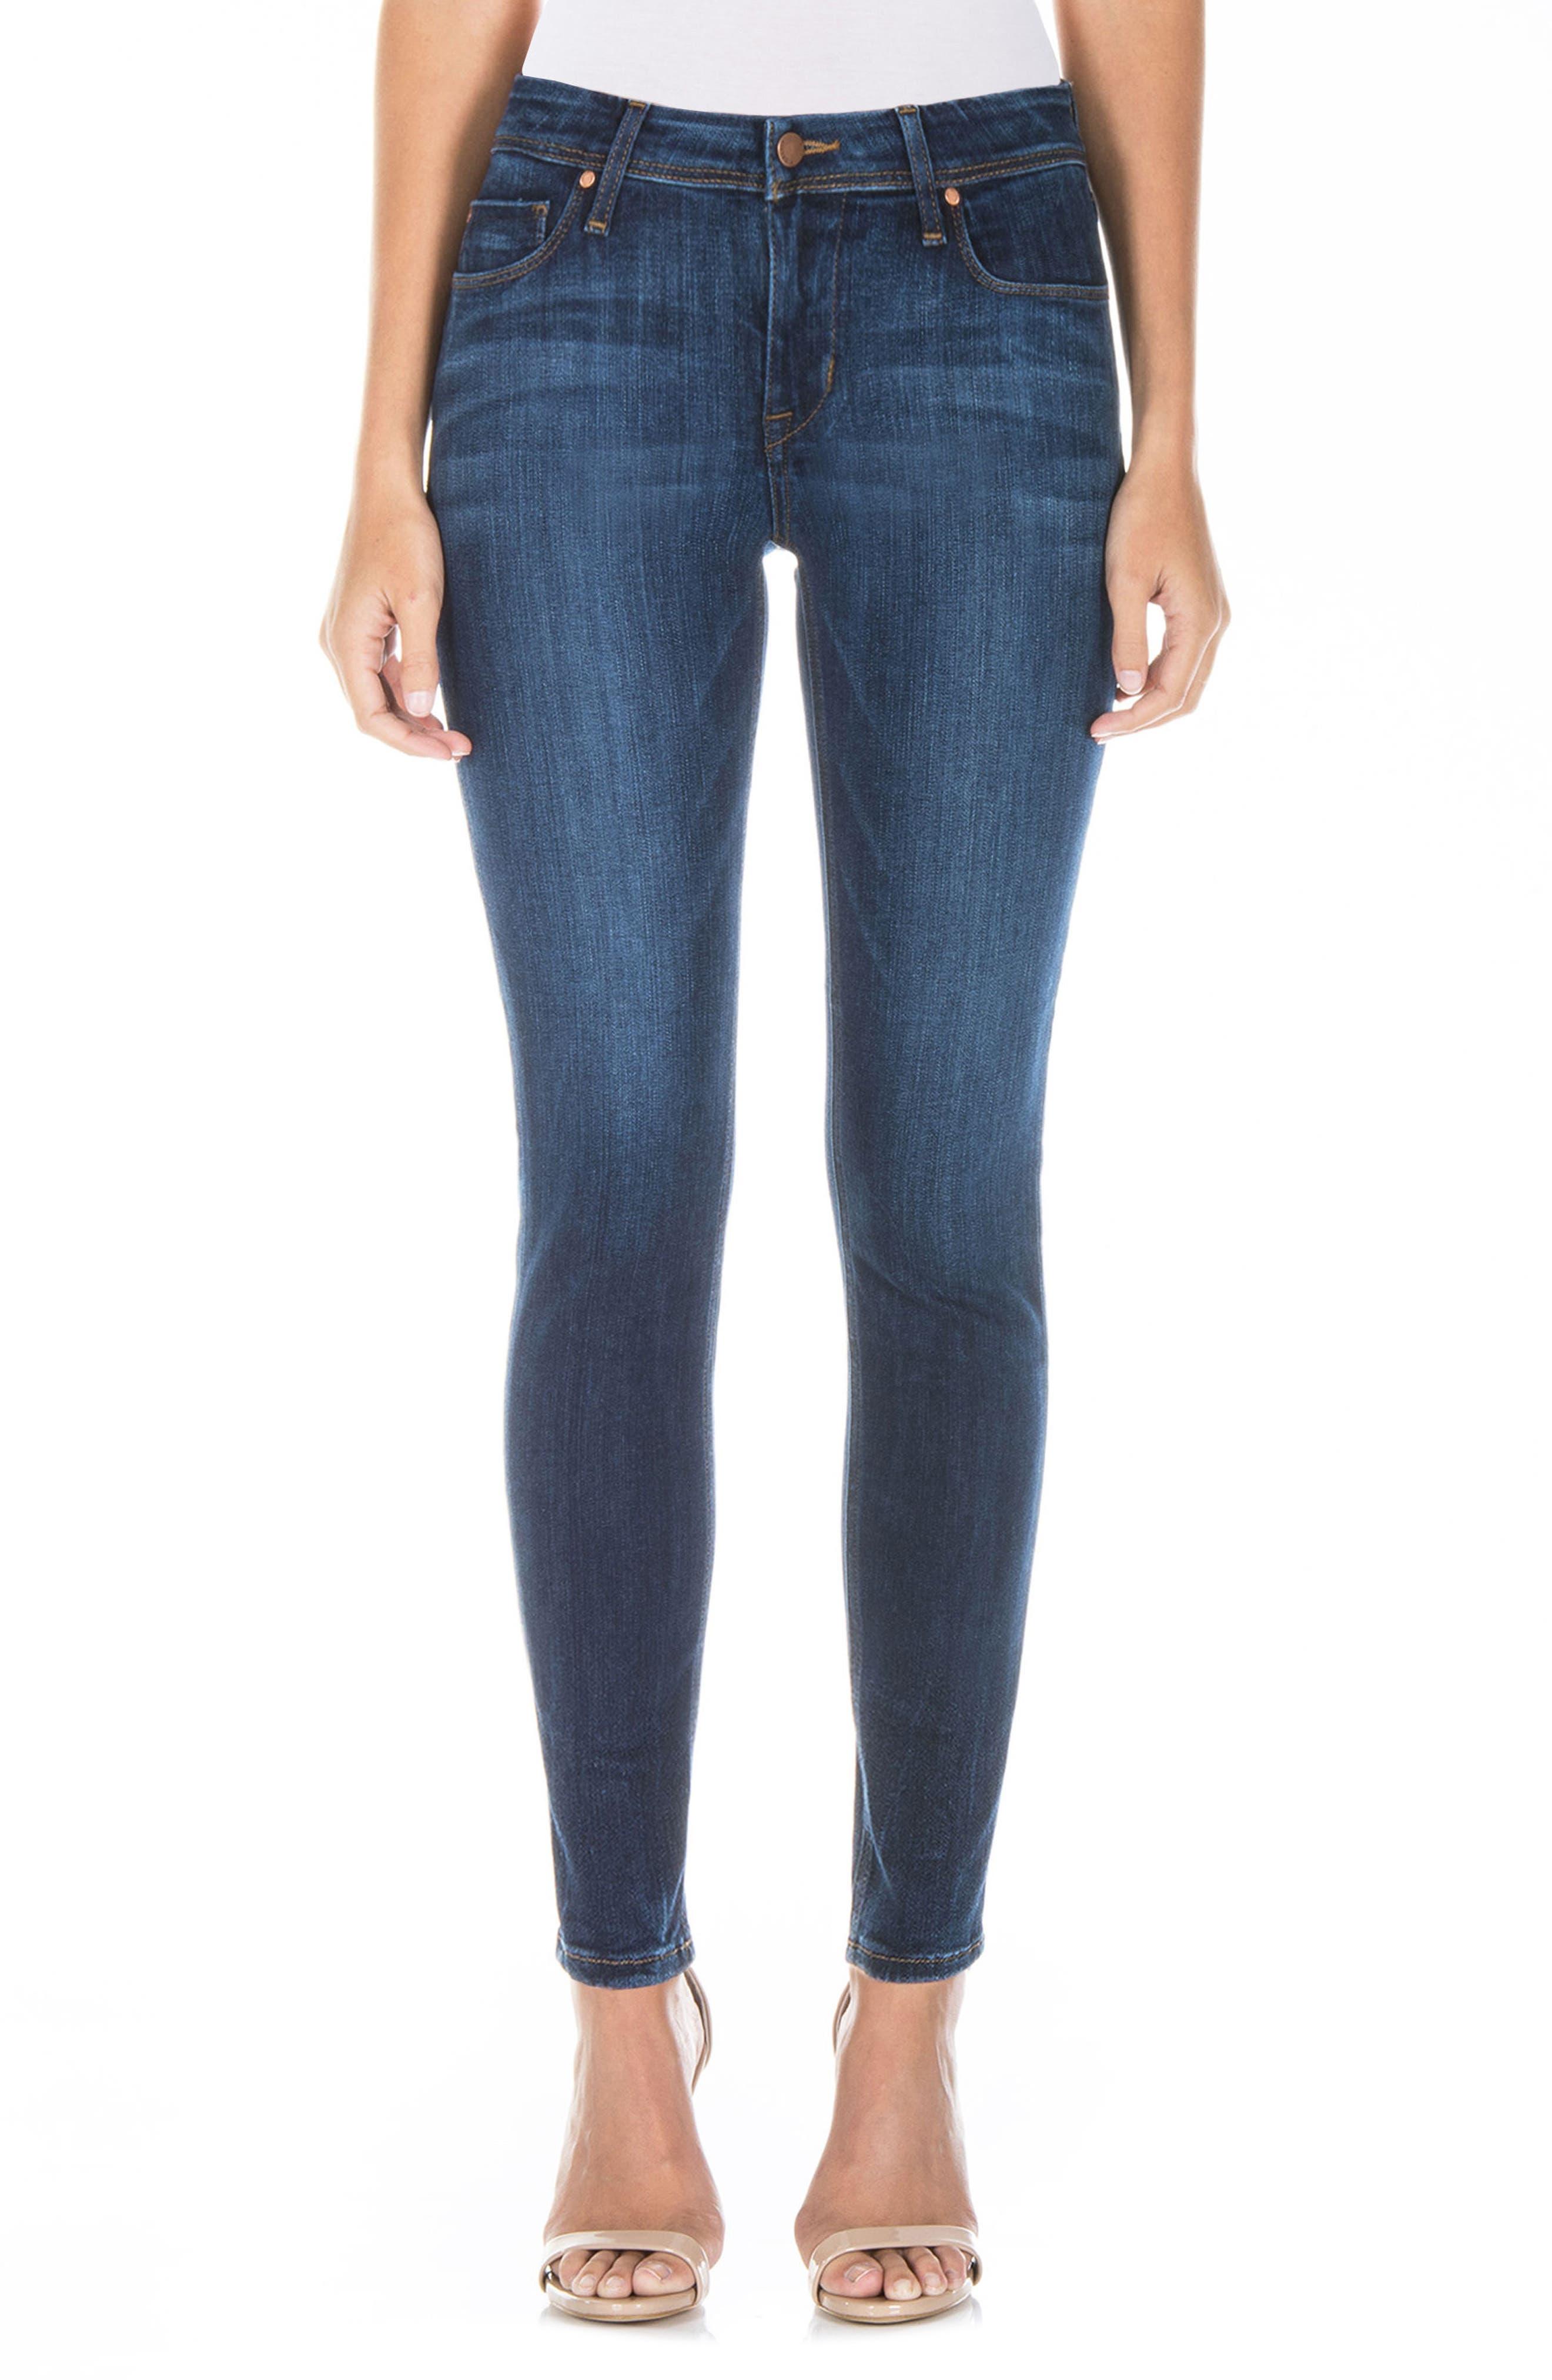 Gwen High Waist Skinny Jeans,                         Main,                         color, Falcon Blue